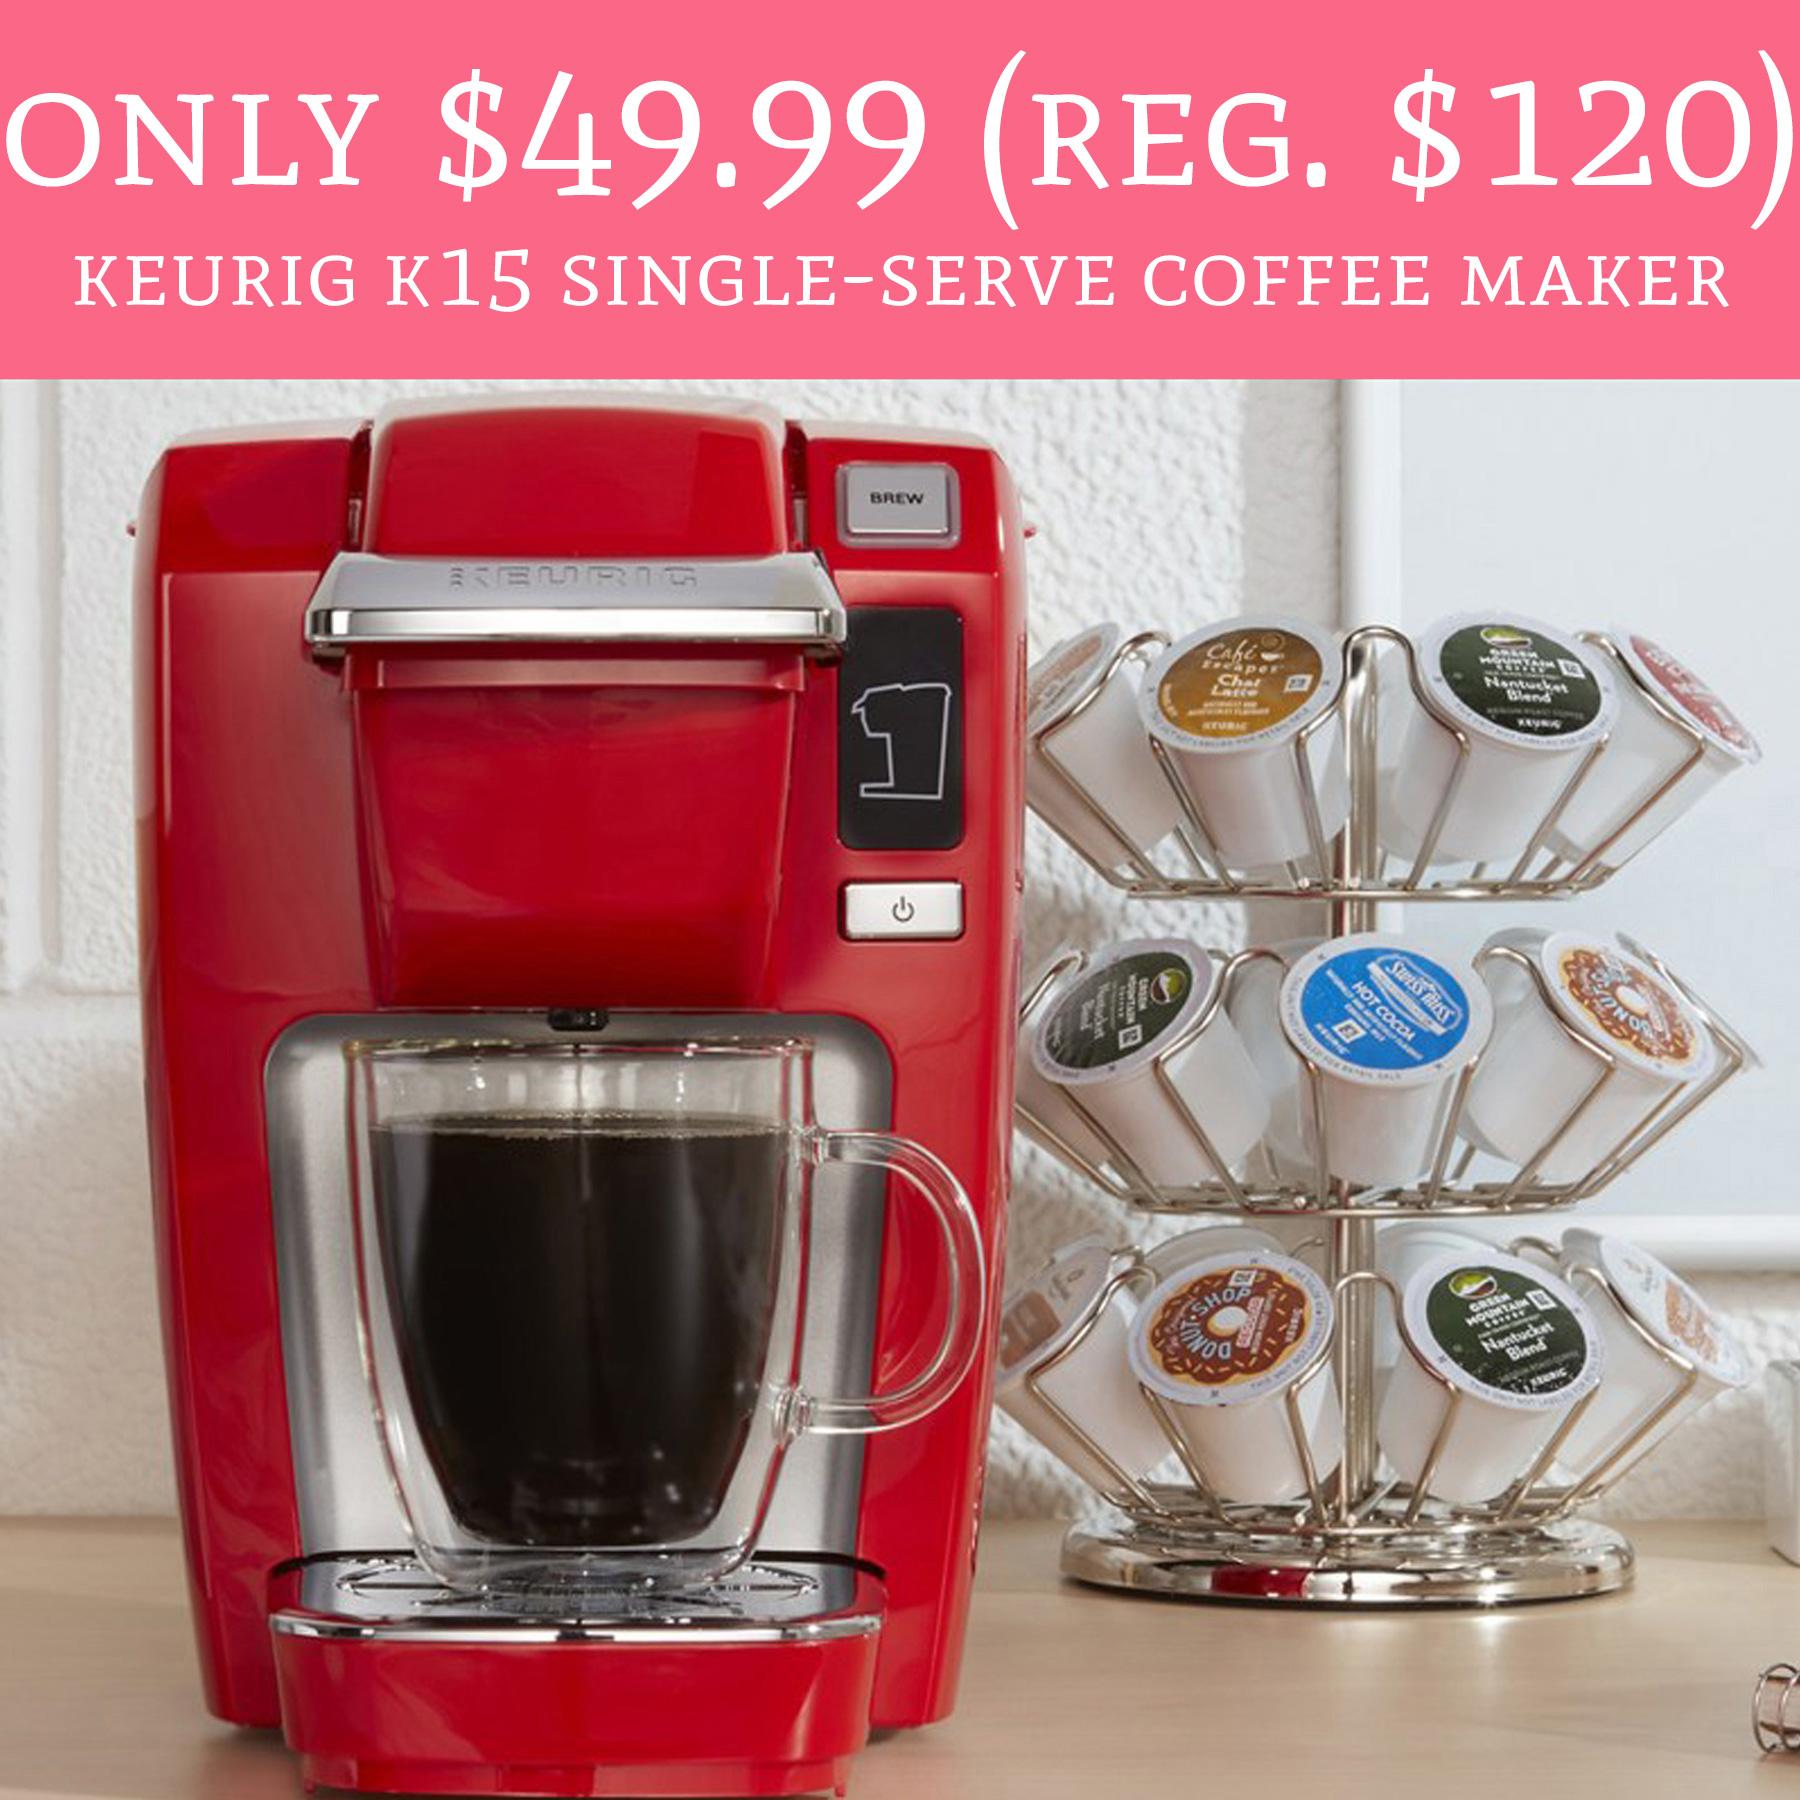 Keurig Coffee Maker On Black Friday : RUN! Only USD 49.99 (Regular USD 120) Keurig K15 Single-Serve Coffee Maker - Deal Hunting Babe